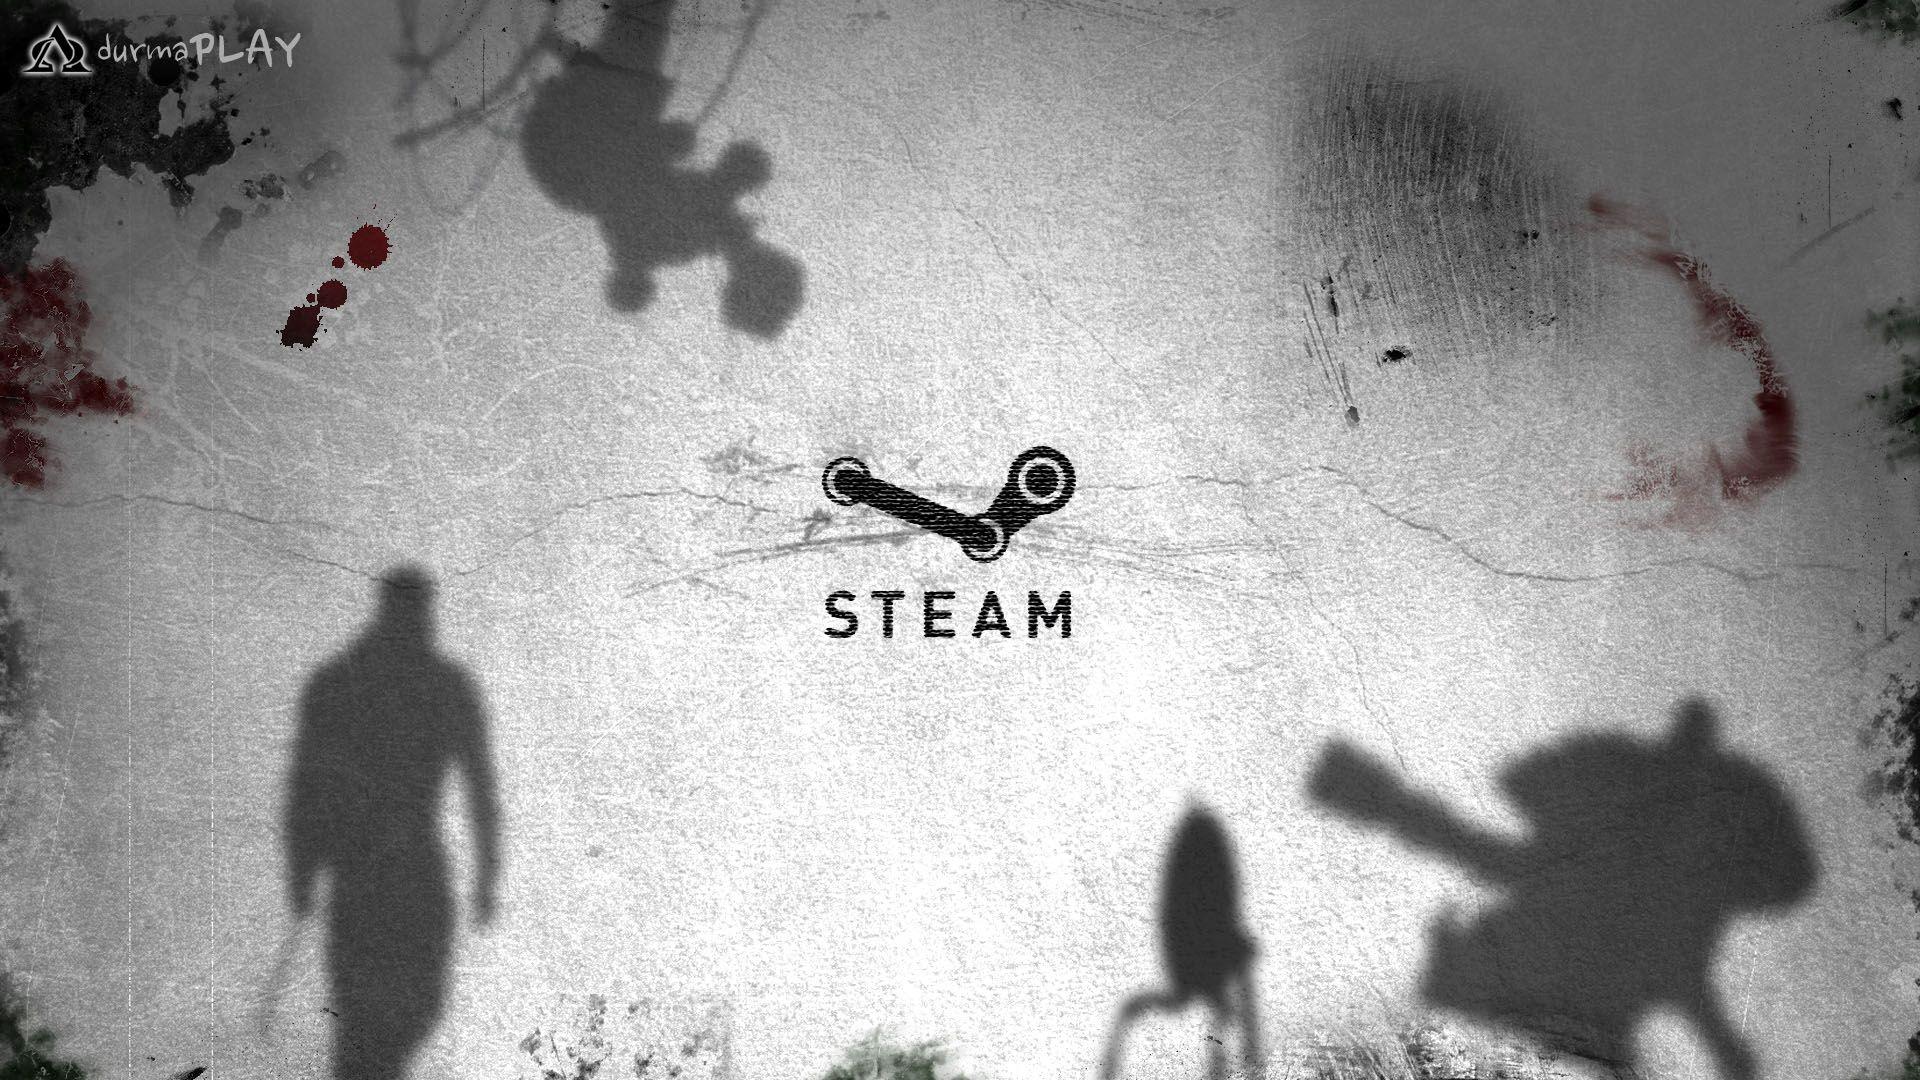 https://www.durmaplay.com/product/steam-wallet-cuzdan-epinleri steam-wallet-steam-cuzdan-kodu-satin-al-durmaplay-oyun-002.jpg 1.920×1.080 piksel